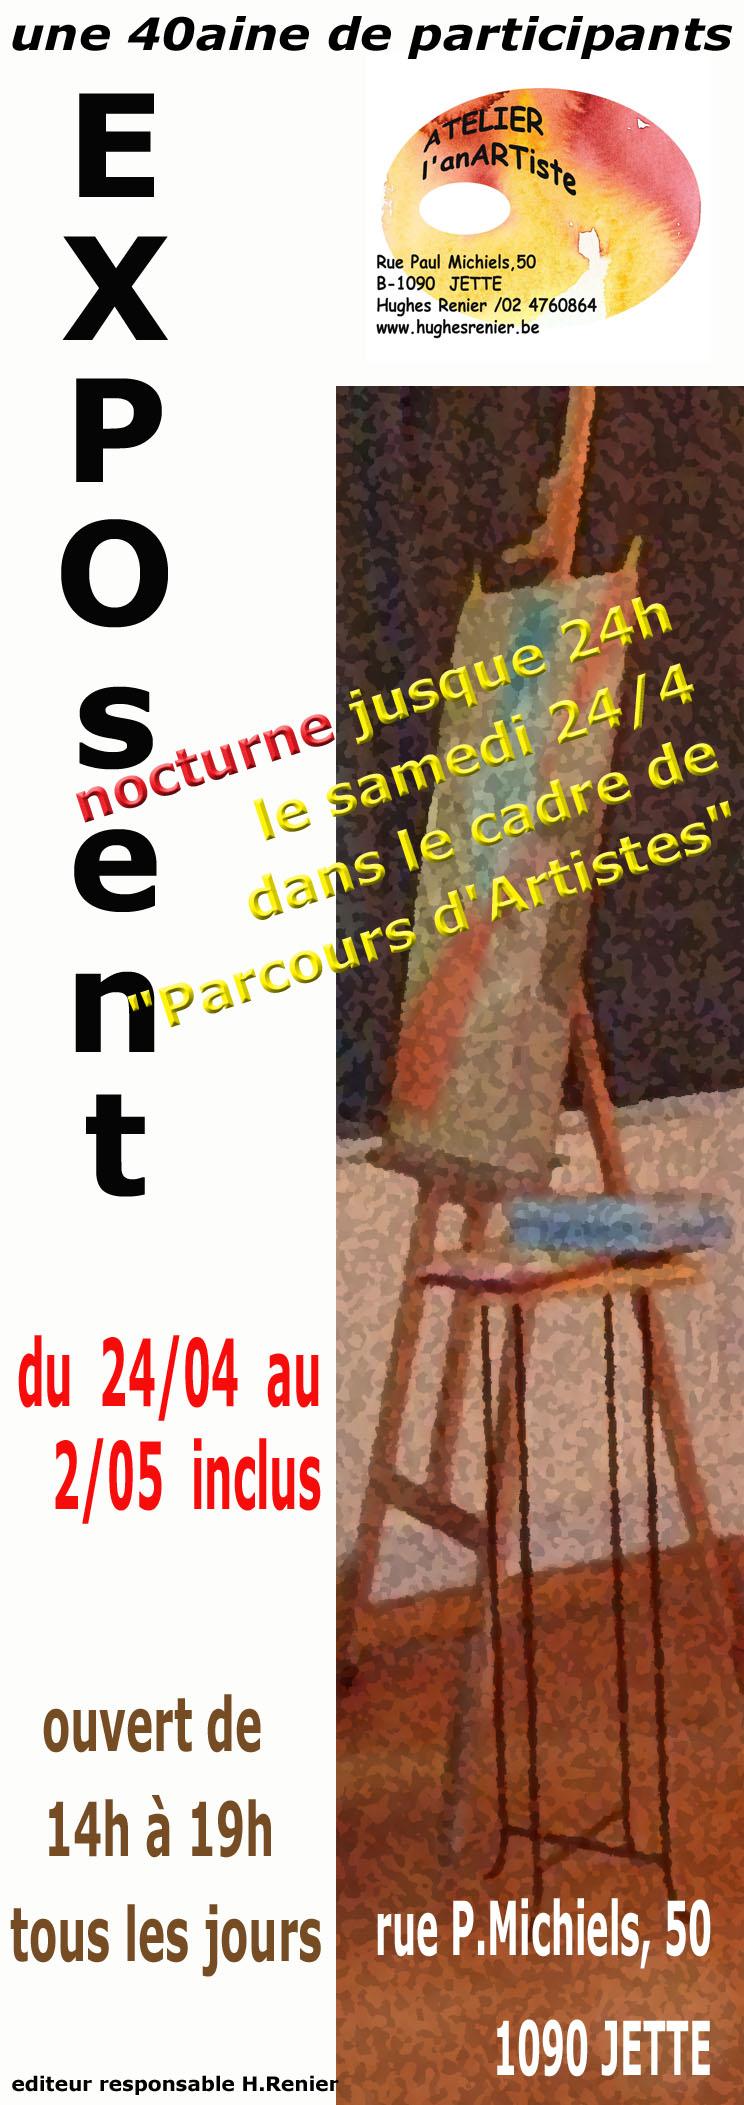 affiche-expo-2010 copie